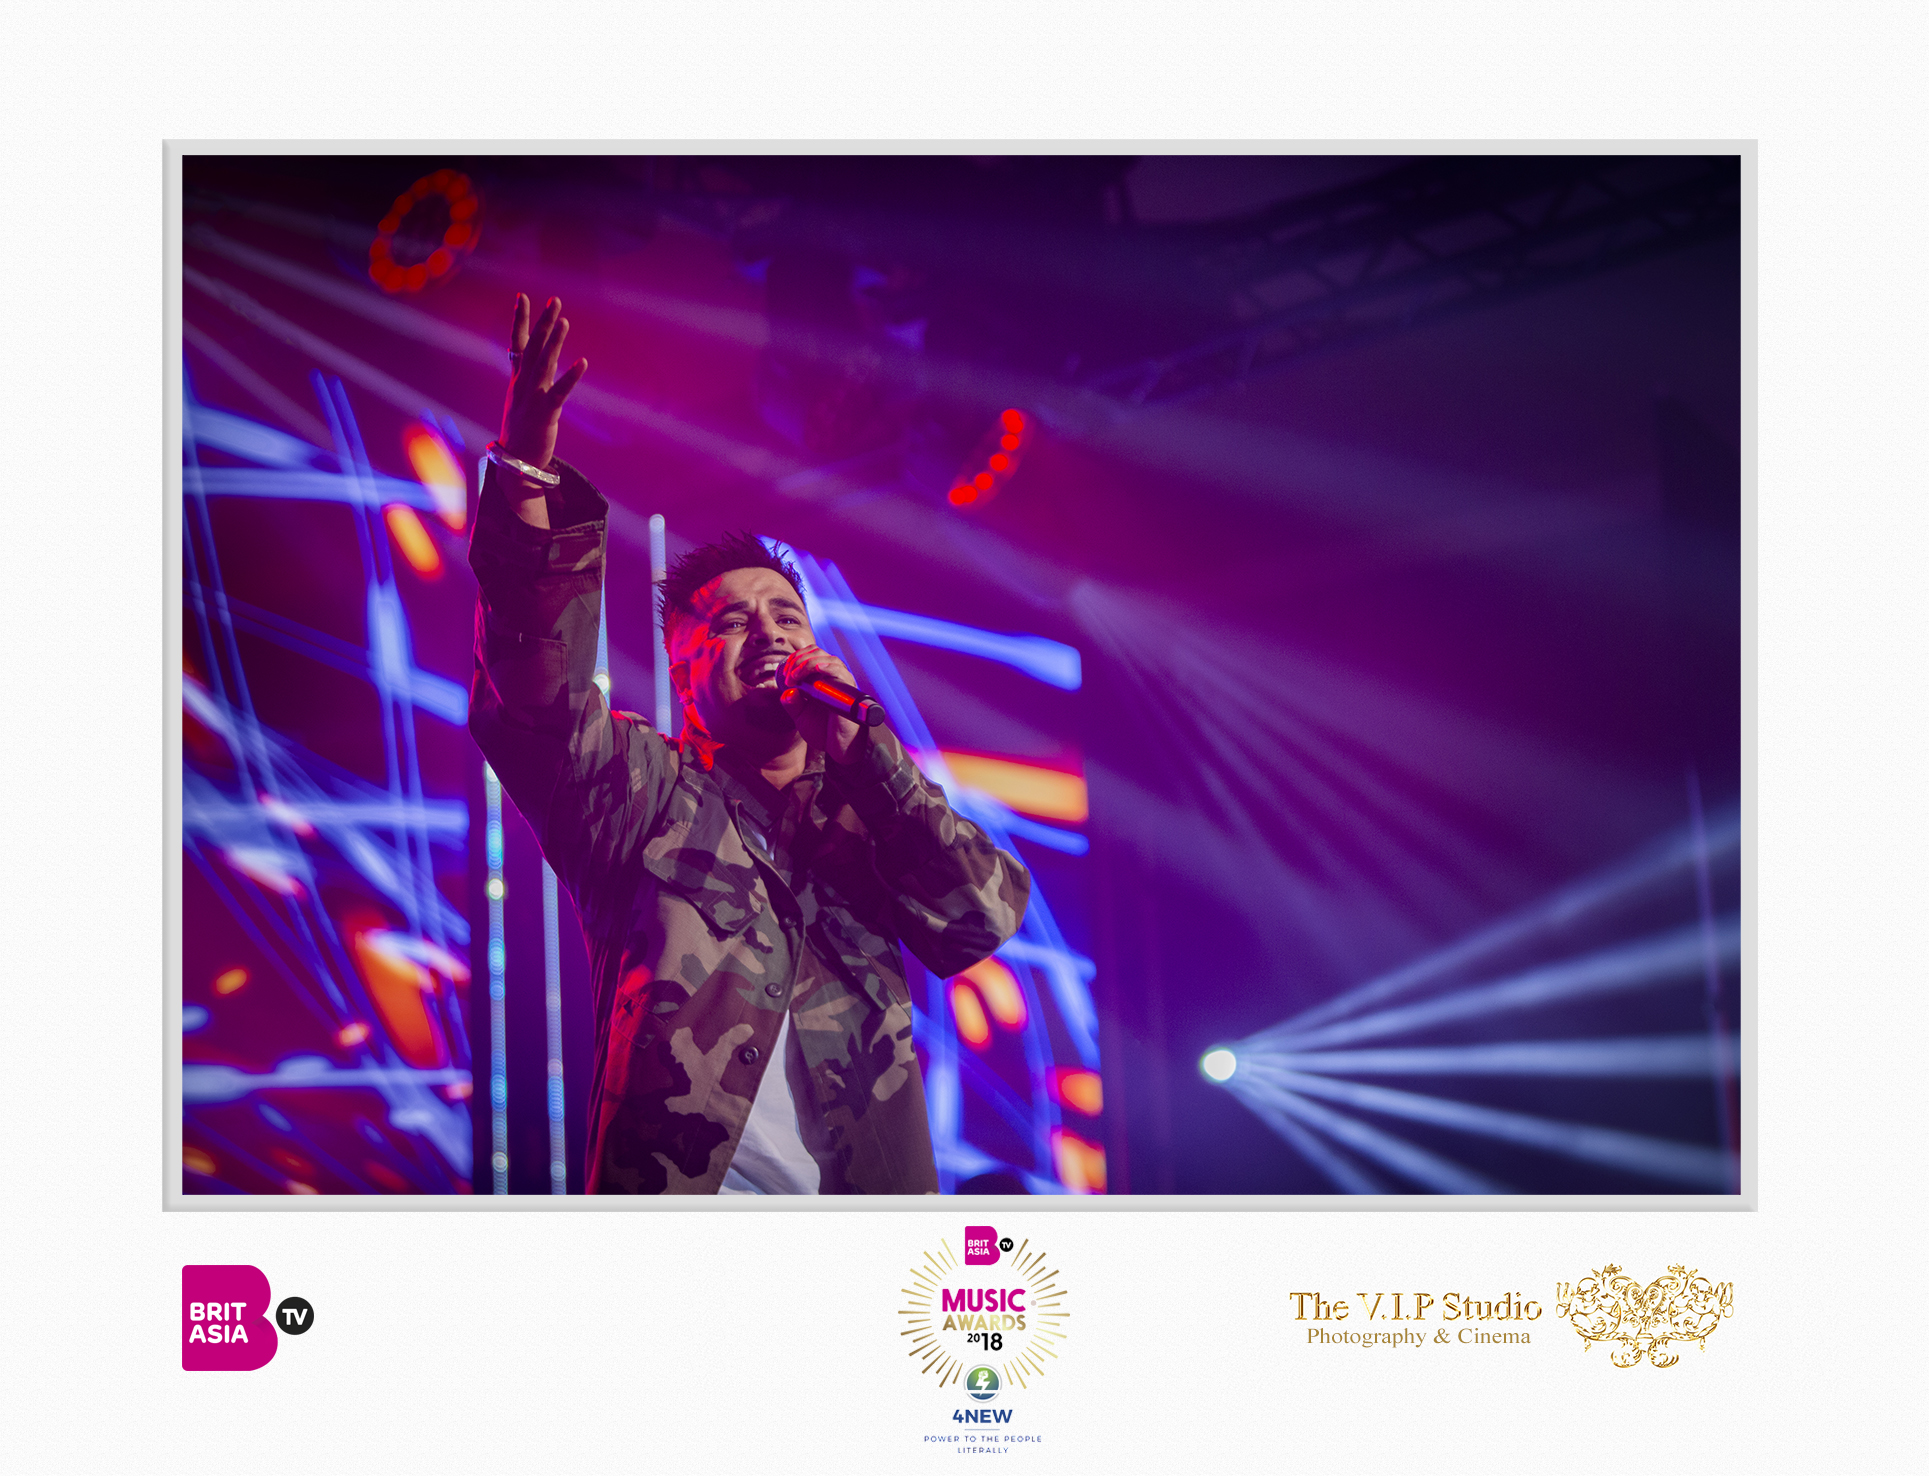 The VIP Studio - BritAsia Music Awards - JK